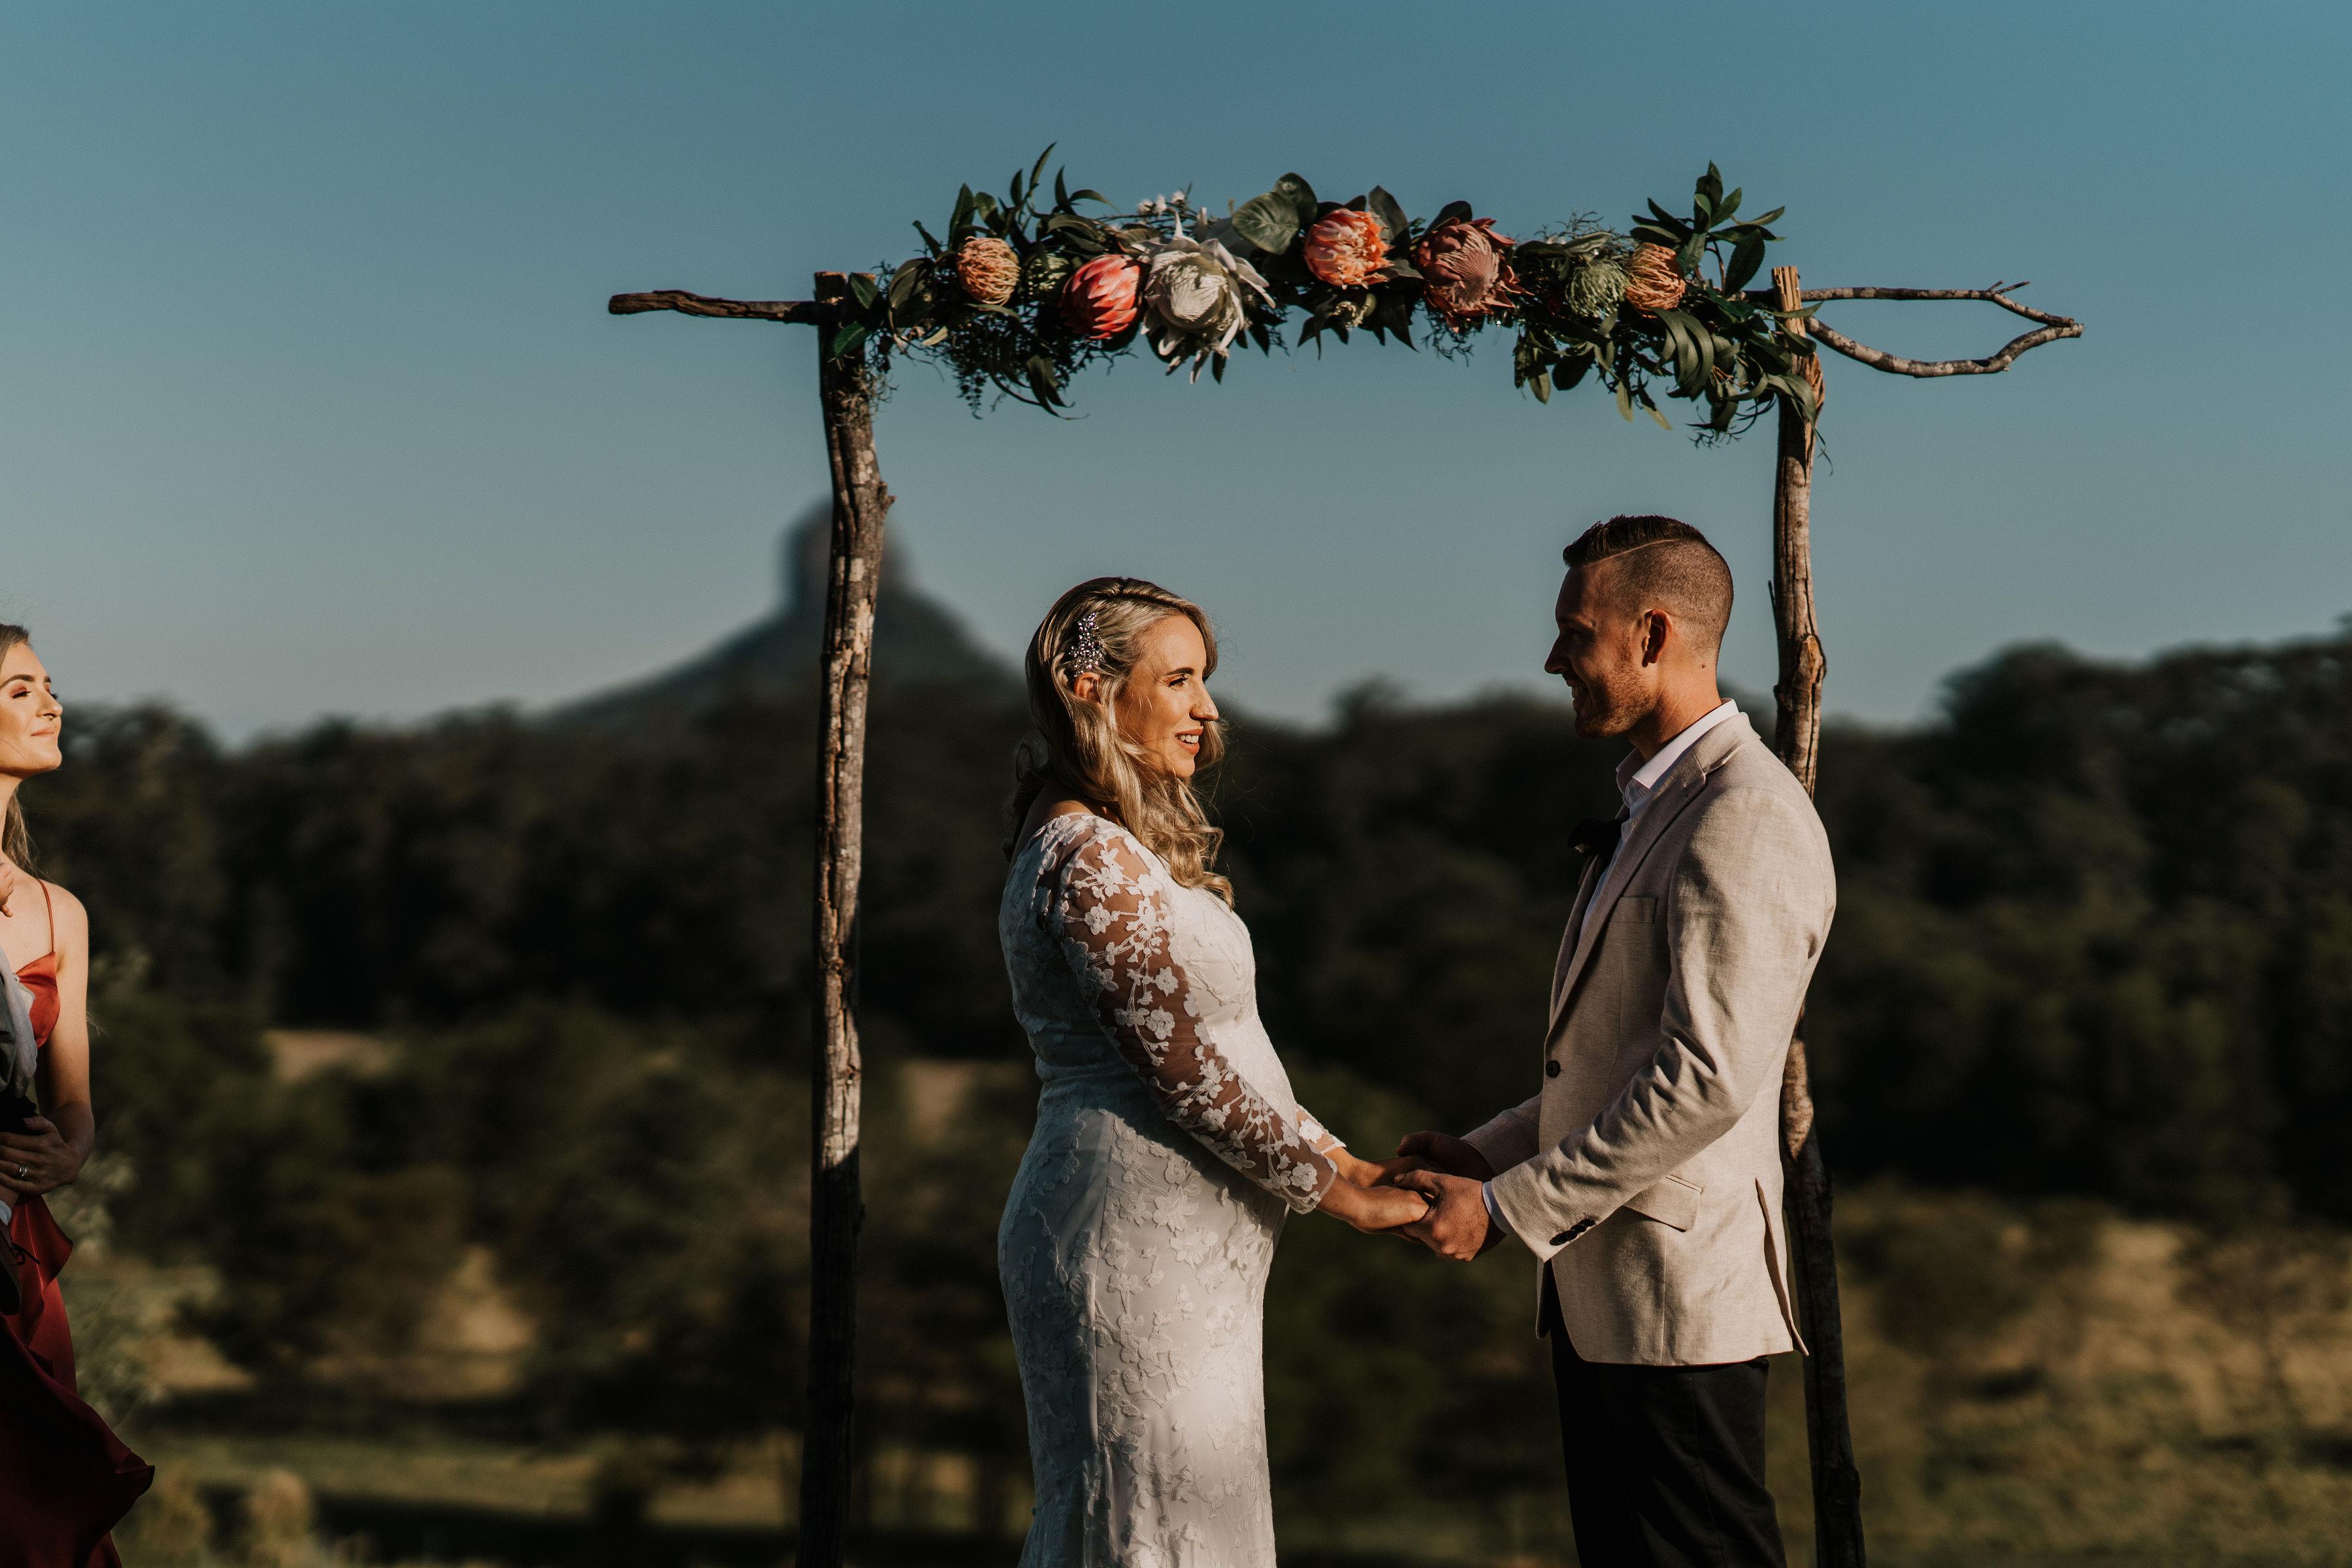 Dream wedding ceremonies, wedding stylin